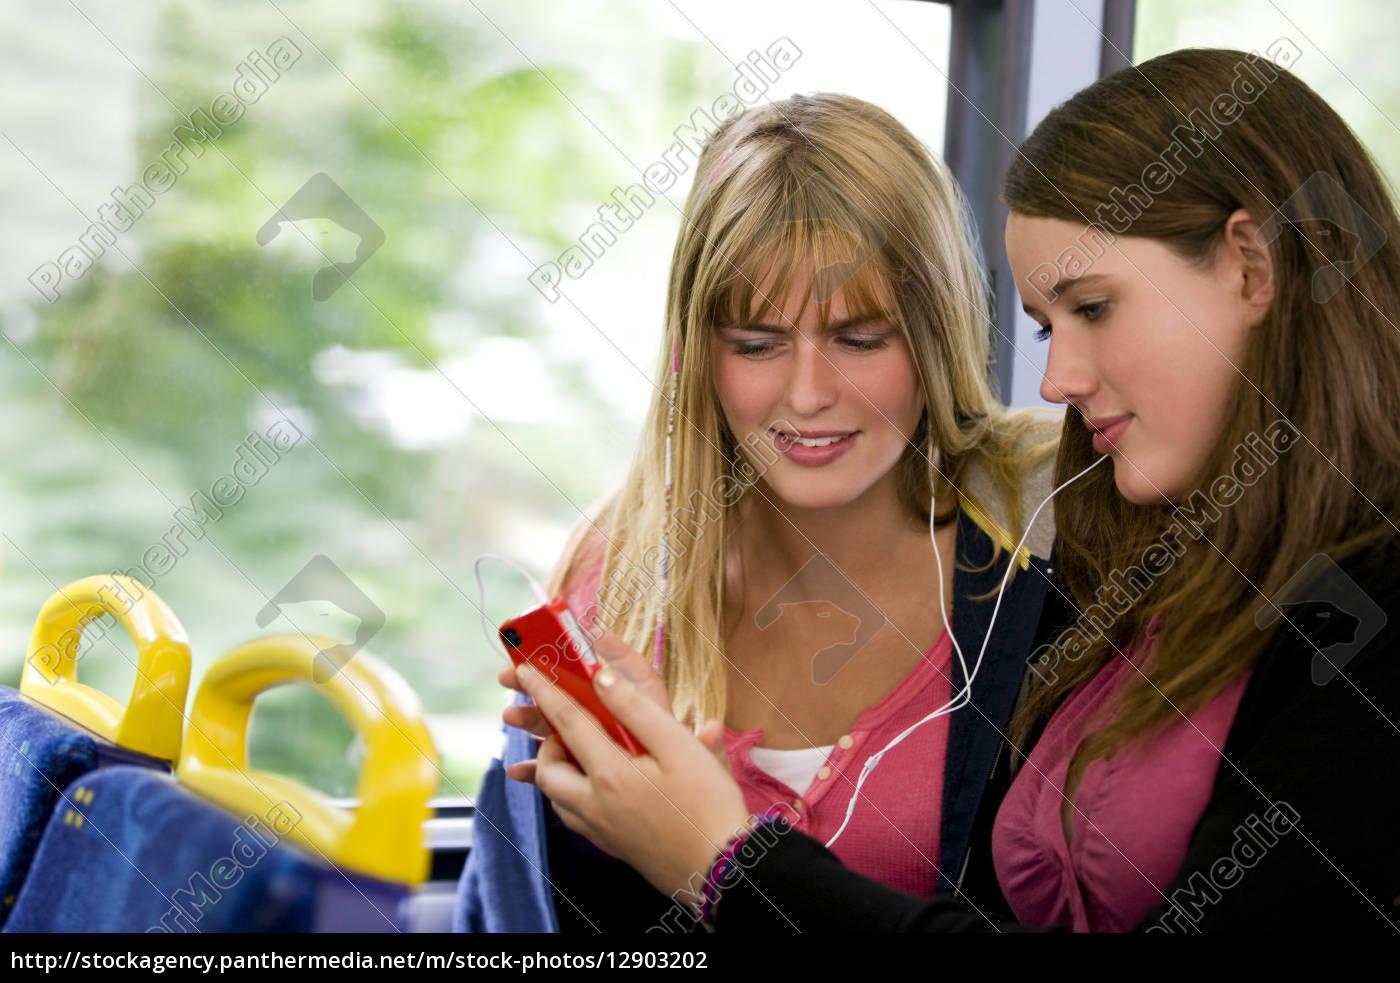 frau, telefon, telephon, lachen, lacht, lachend - 12903202